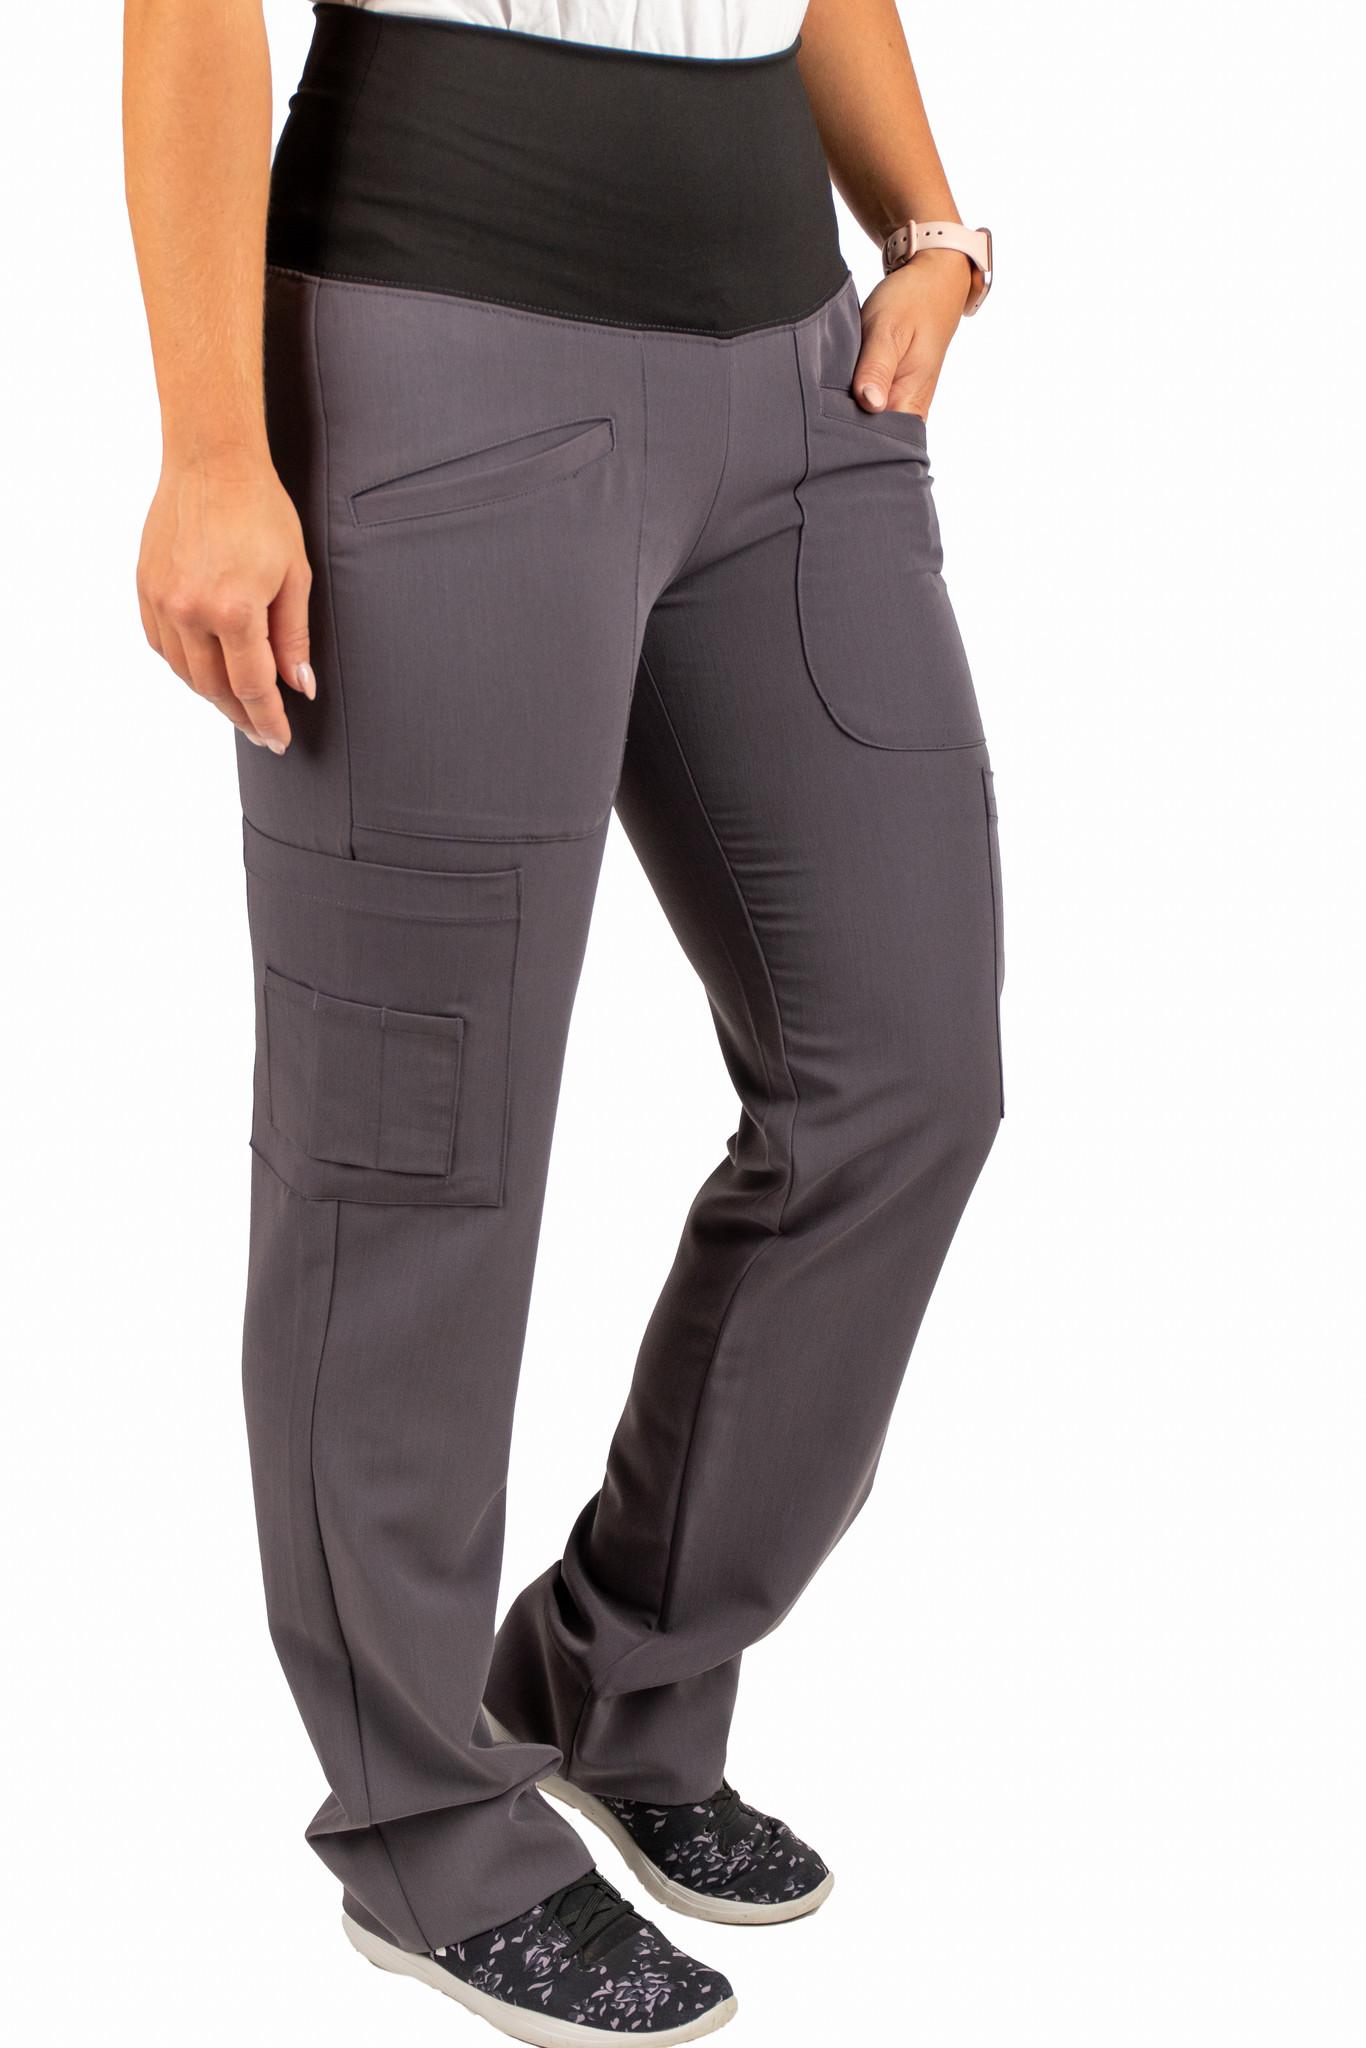 Carbon Women's Yoga Waistband Pants 985